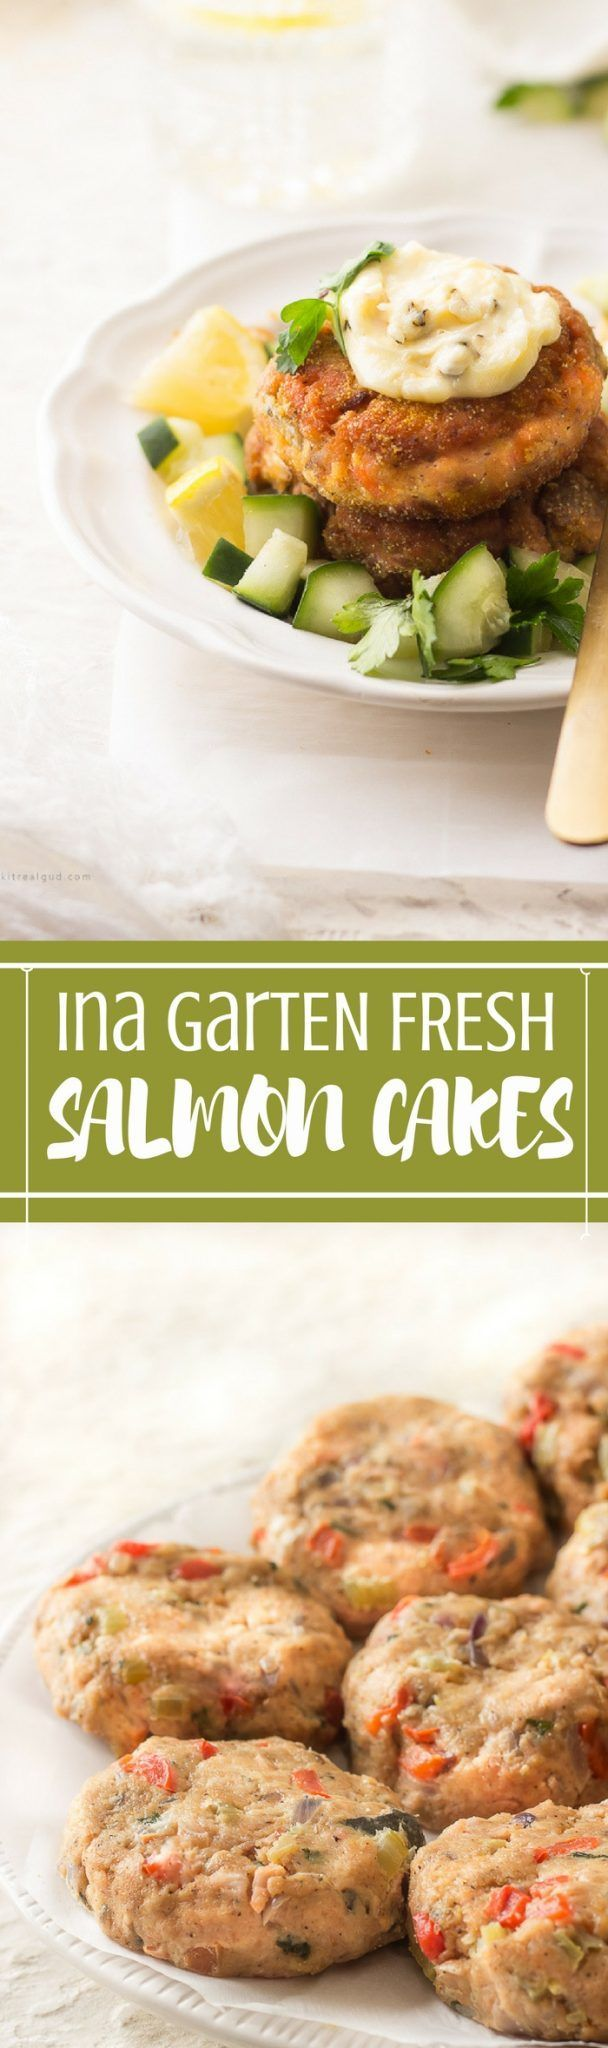 INA GARTEN FRESH SALMON CAKES